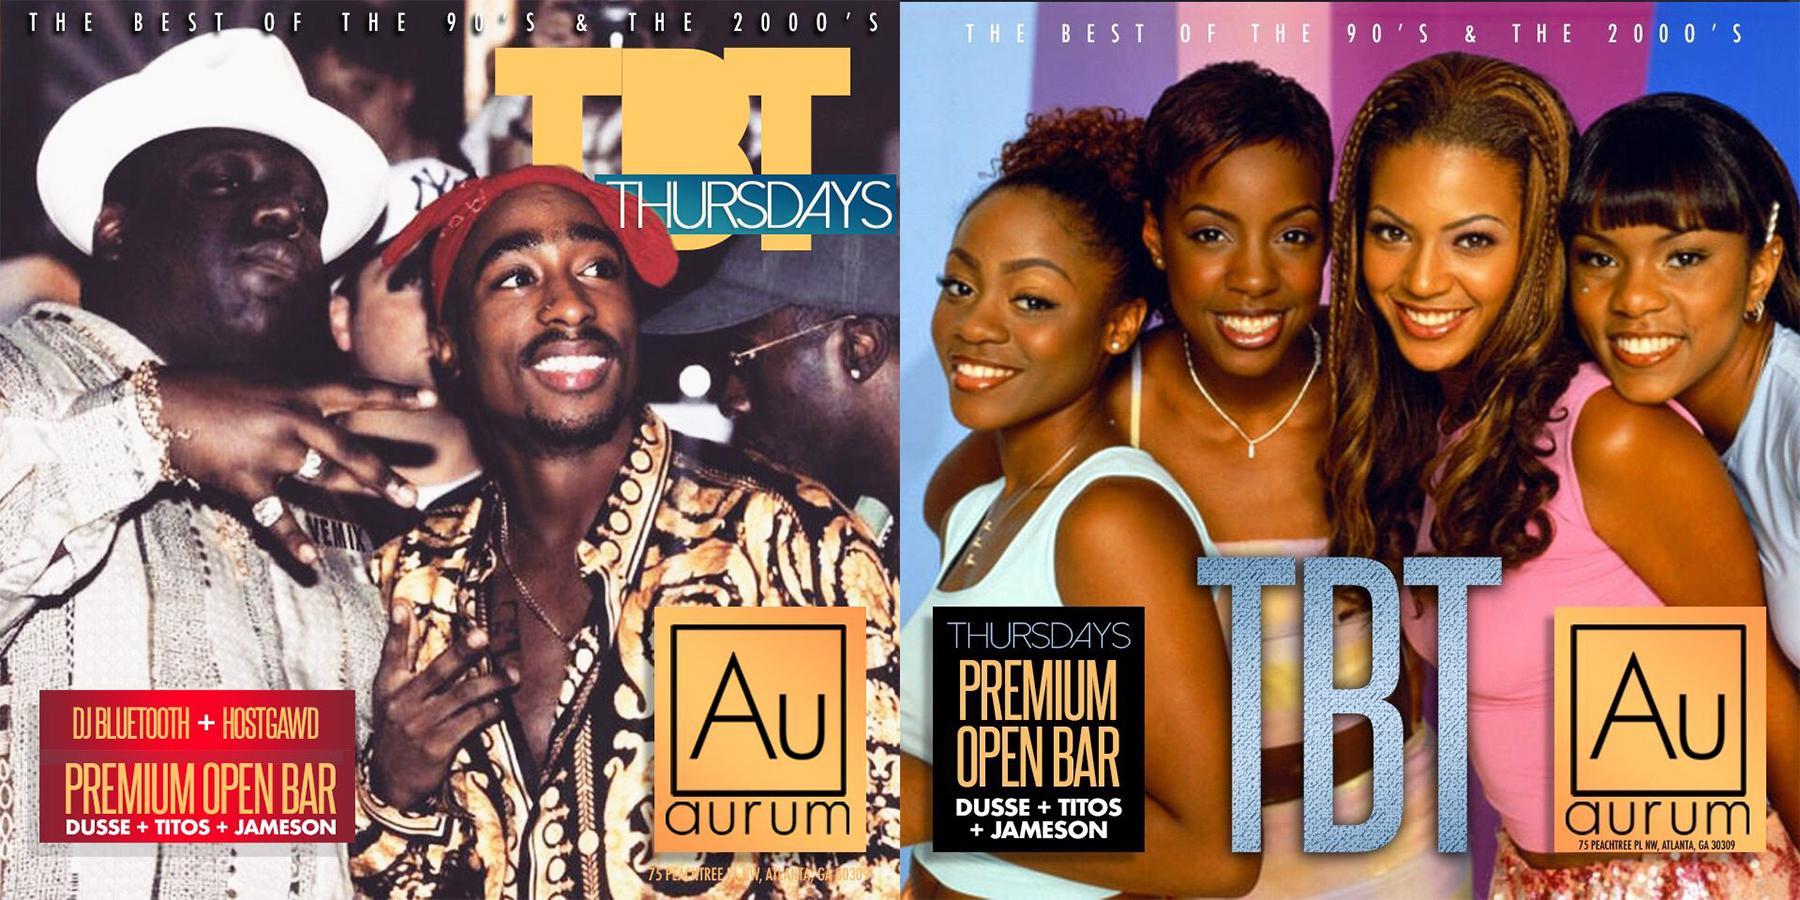 TBT Thursdays: OPEN BAR Dusse, Titos & Jameson ft. R&B & Old School Music @Aurum